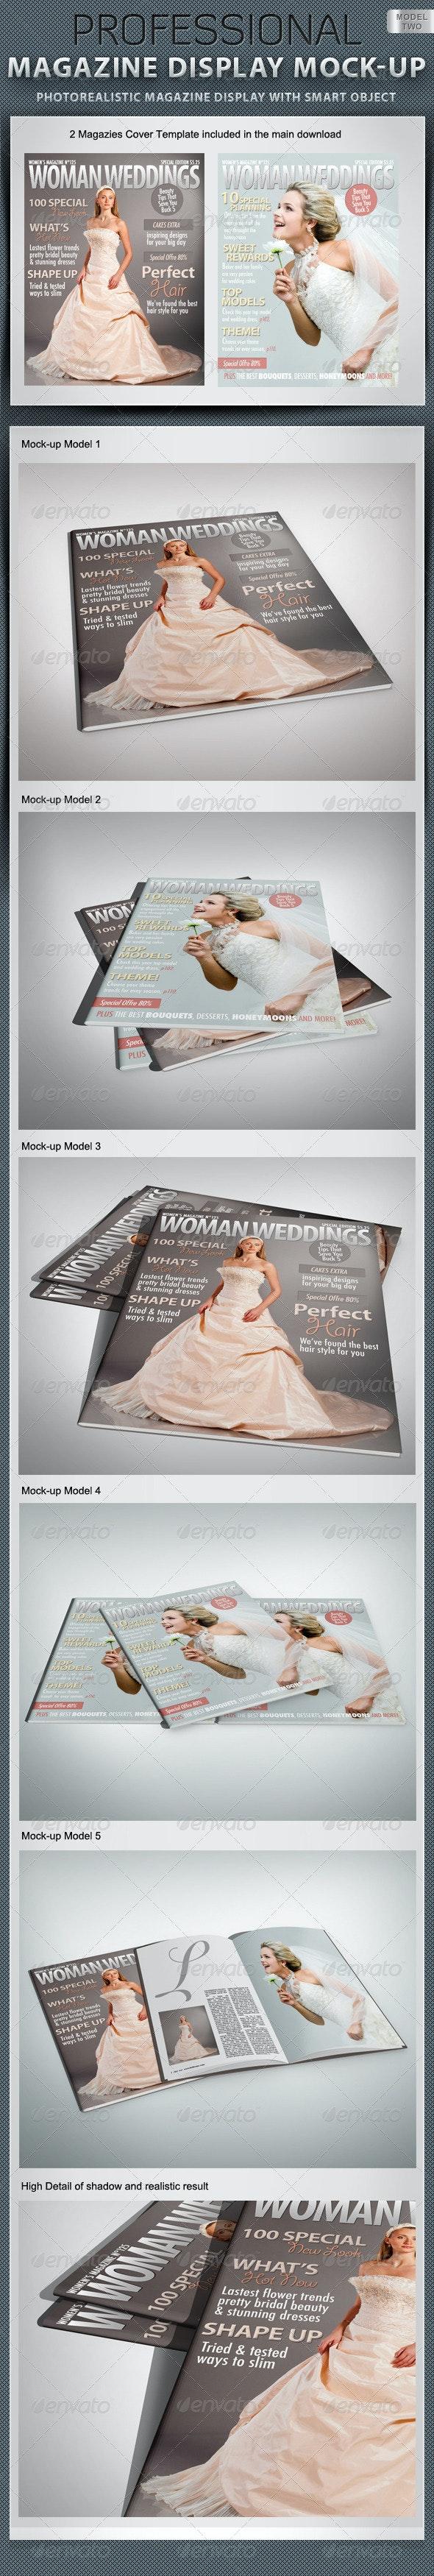 Professional Magazine Display Mock-up V2 - Magazines Print